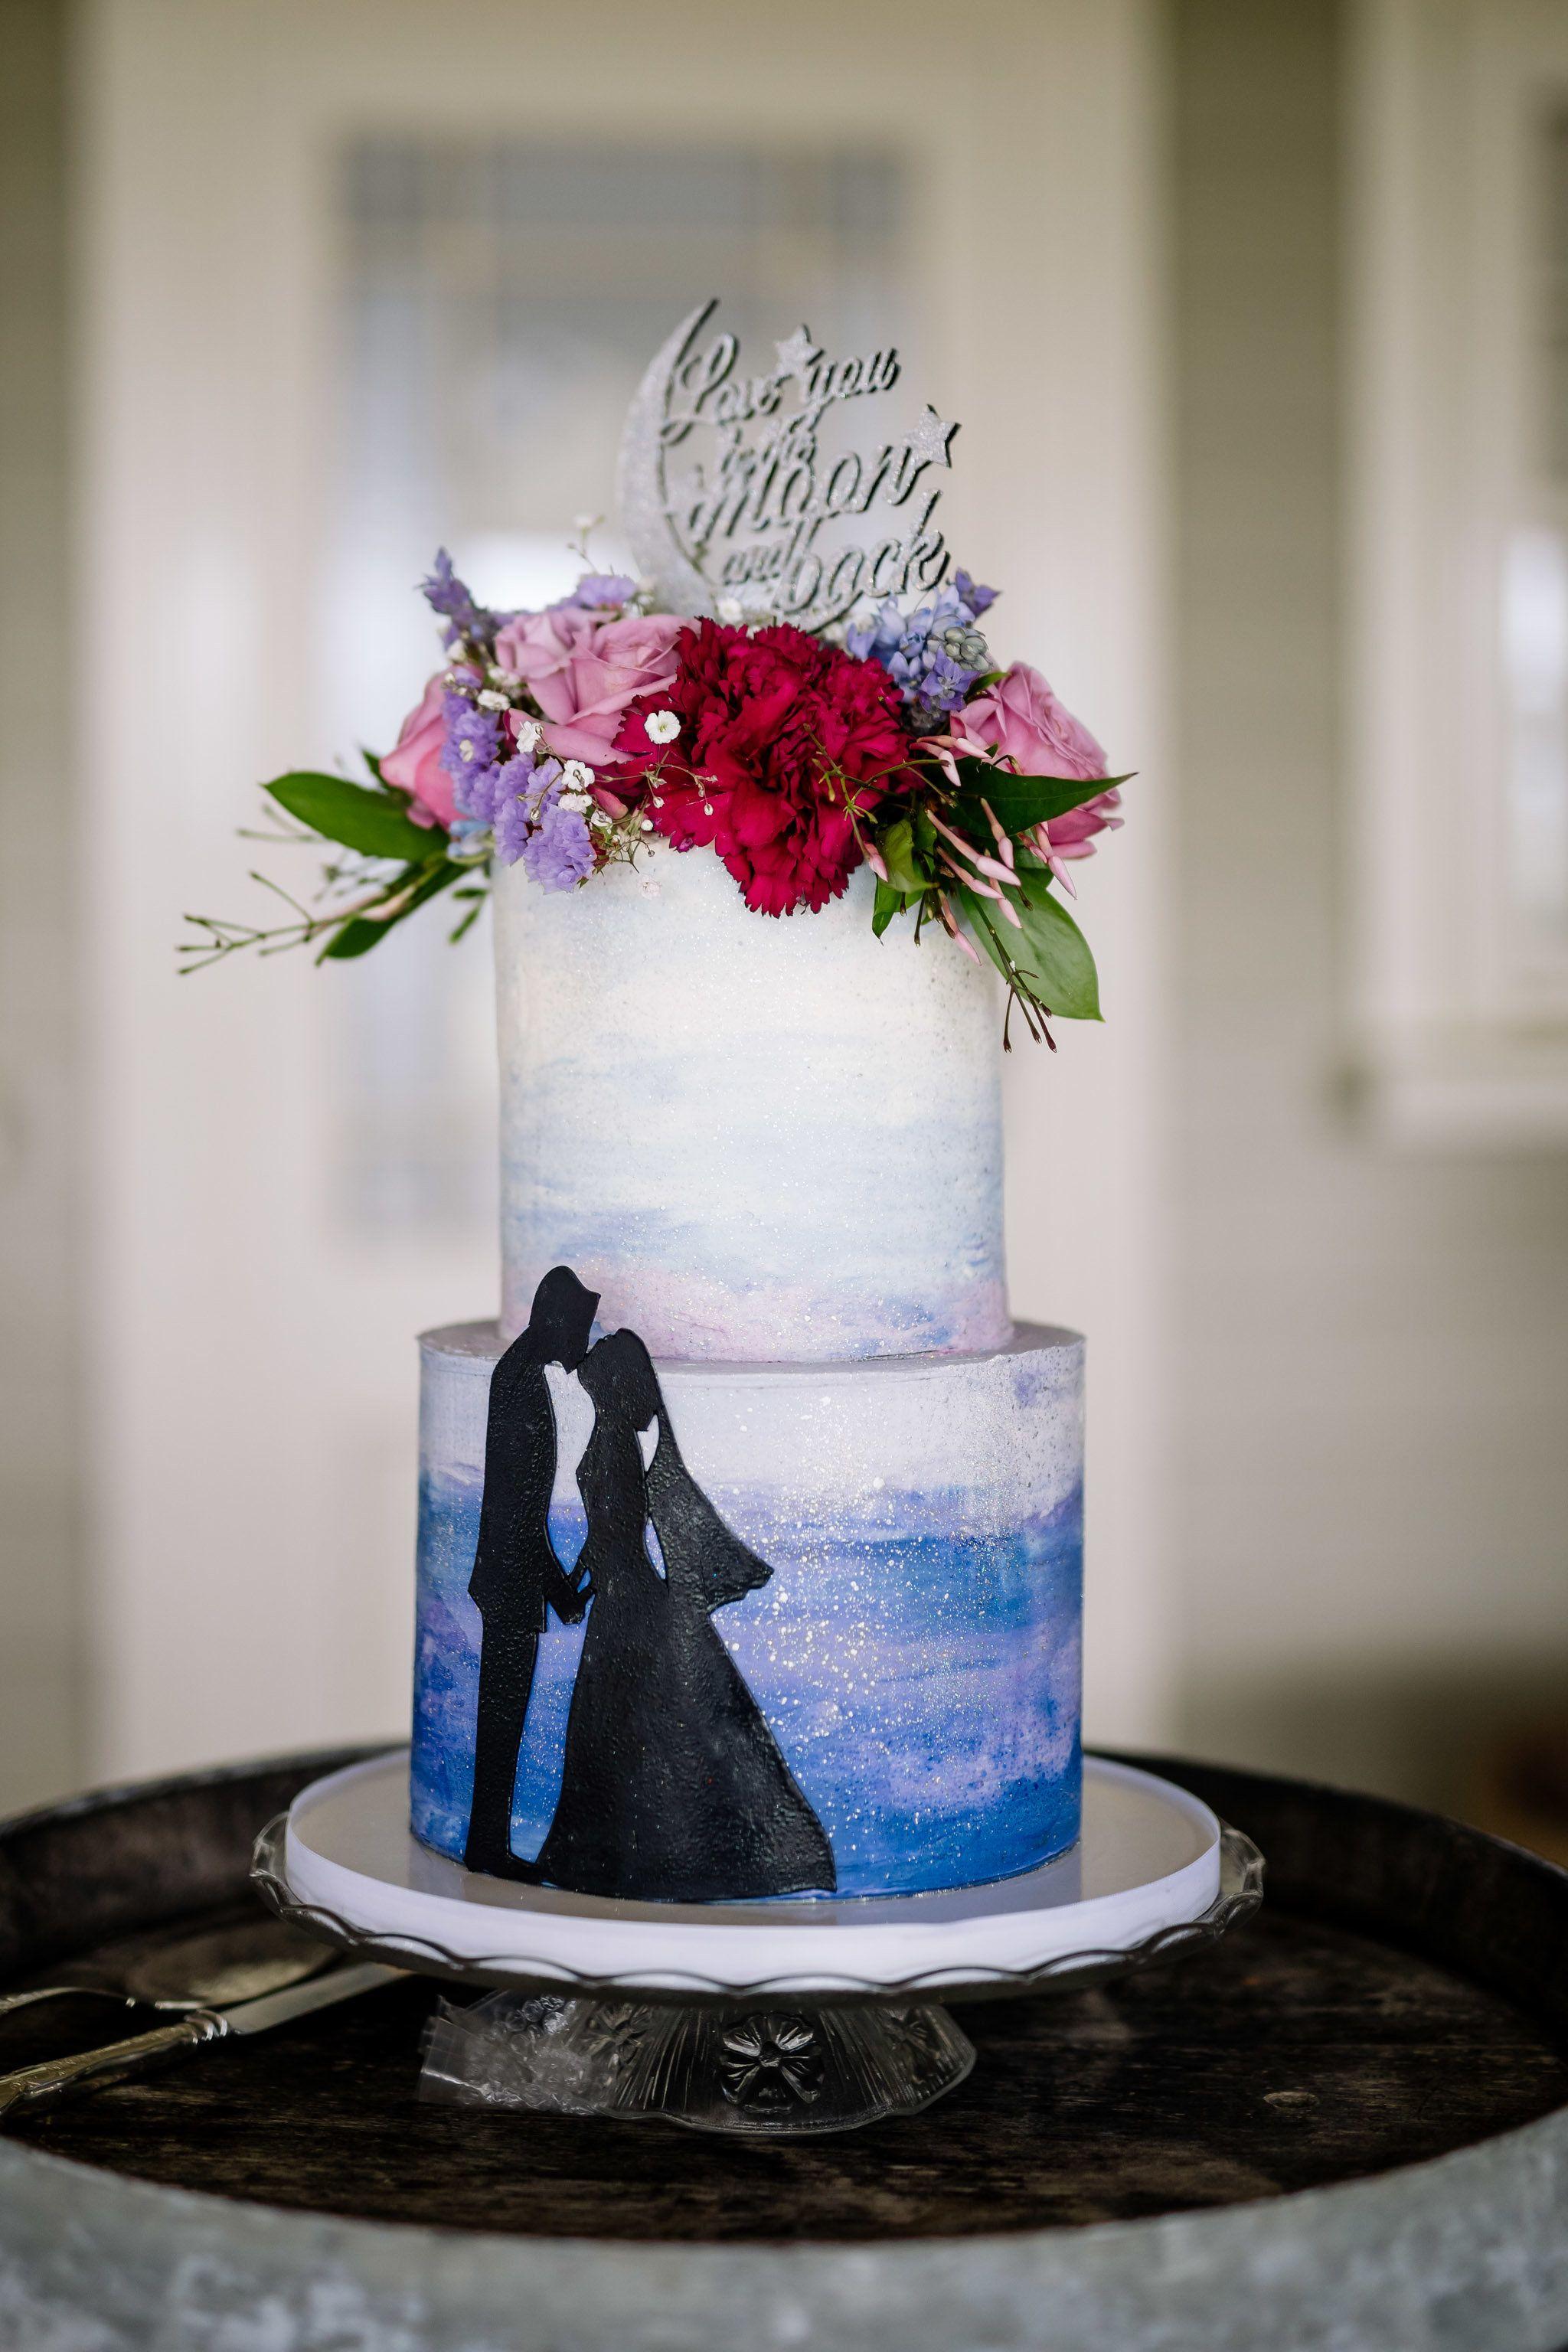 Modern elegant wedding cake design inspired by romance and true love